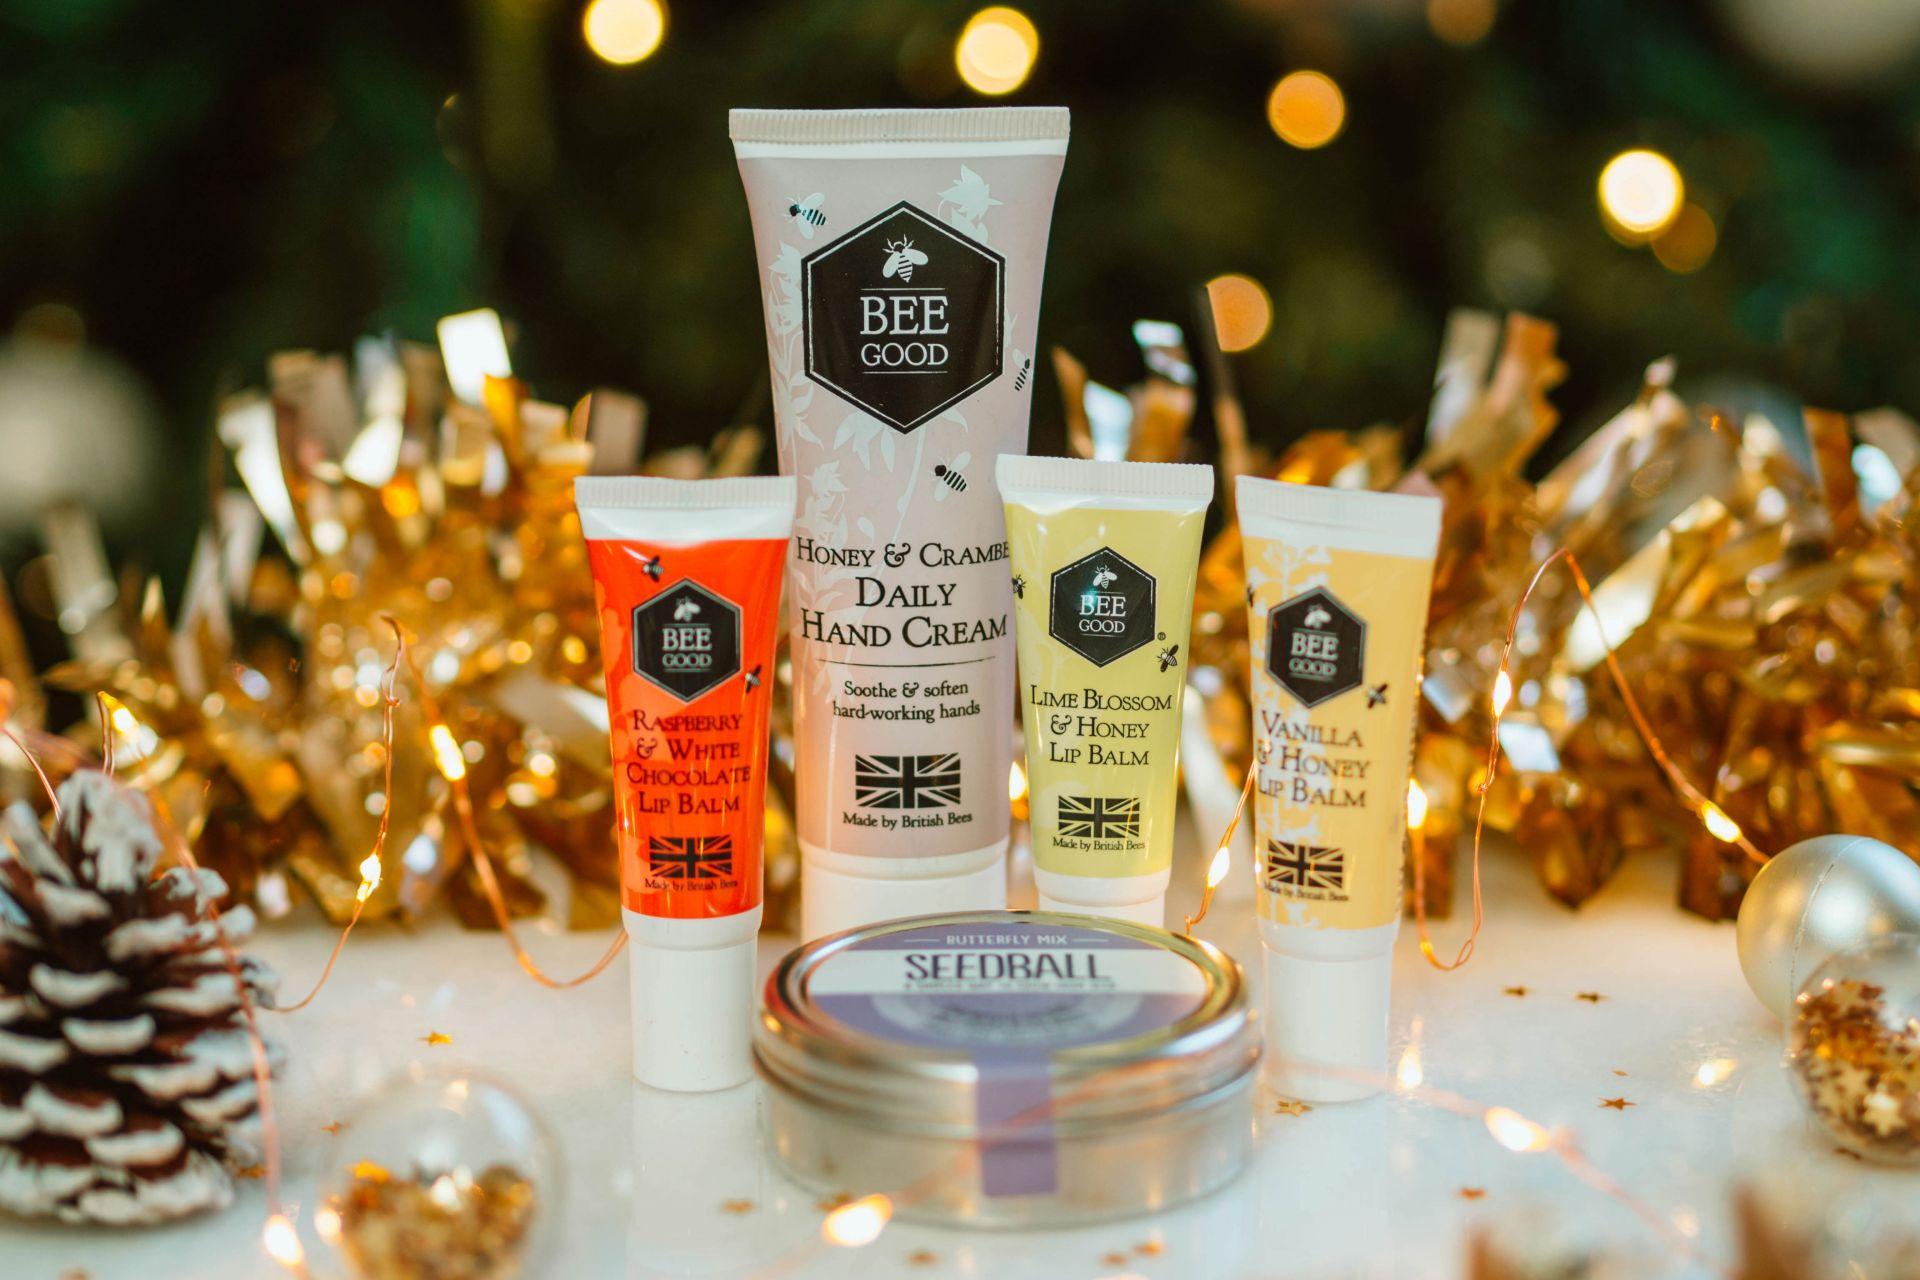 Bee Good - British clean beauty brand